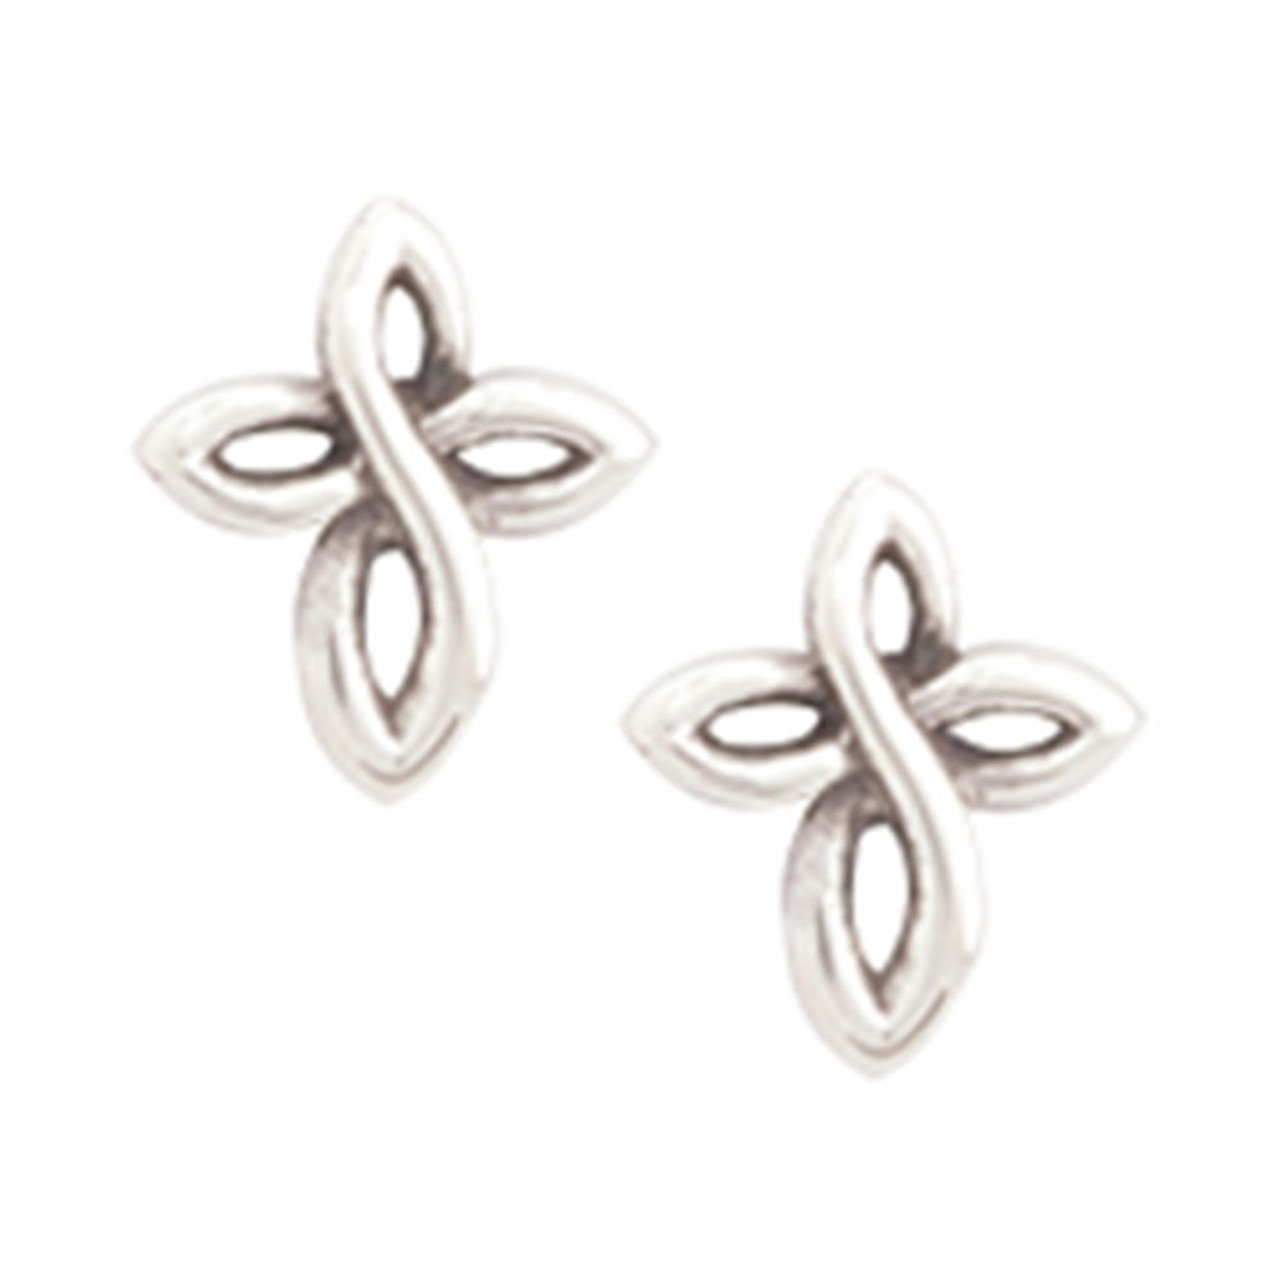 Cross Earrings, Twist Design, Rhodium (silver color) Plated